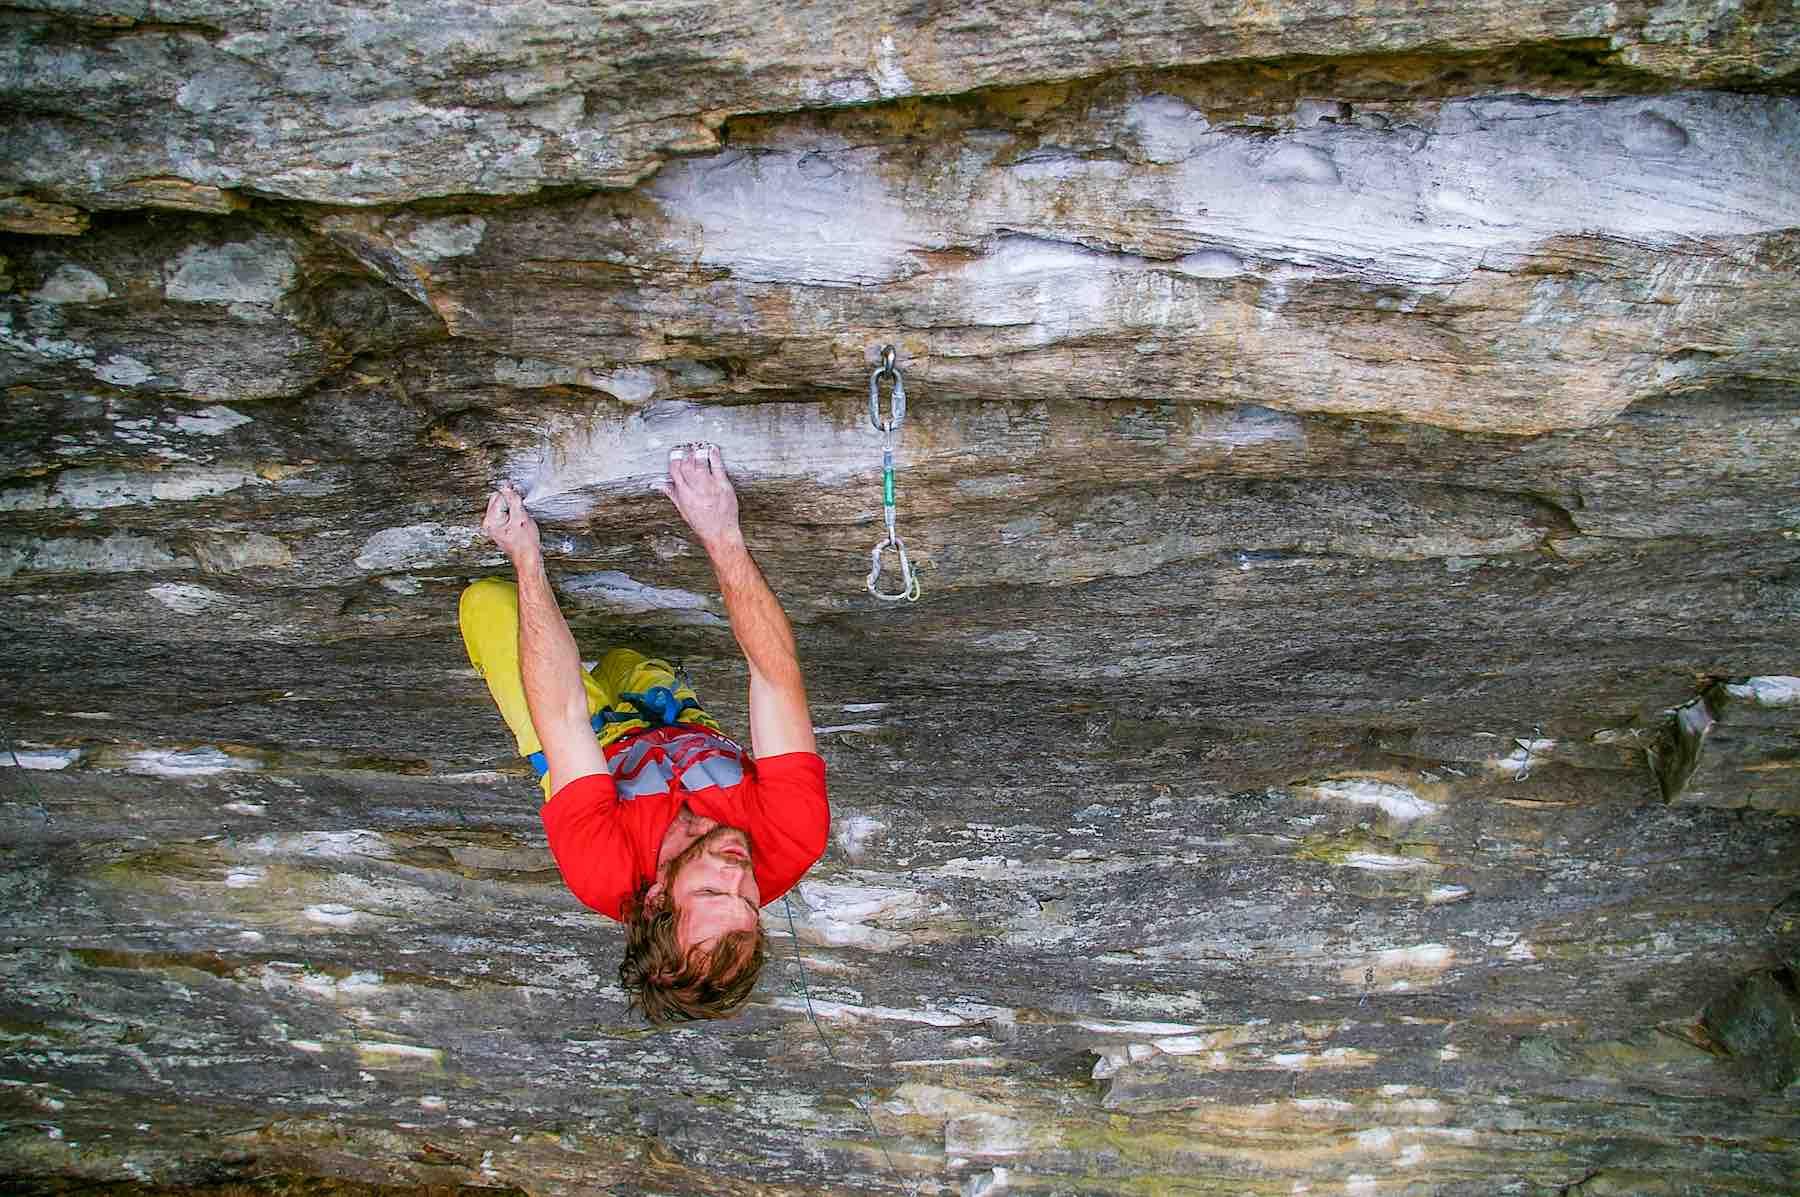 Tyrel Fuller Rock Climbing